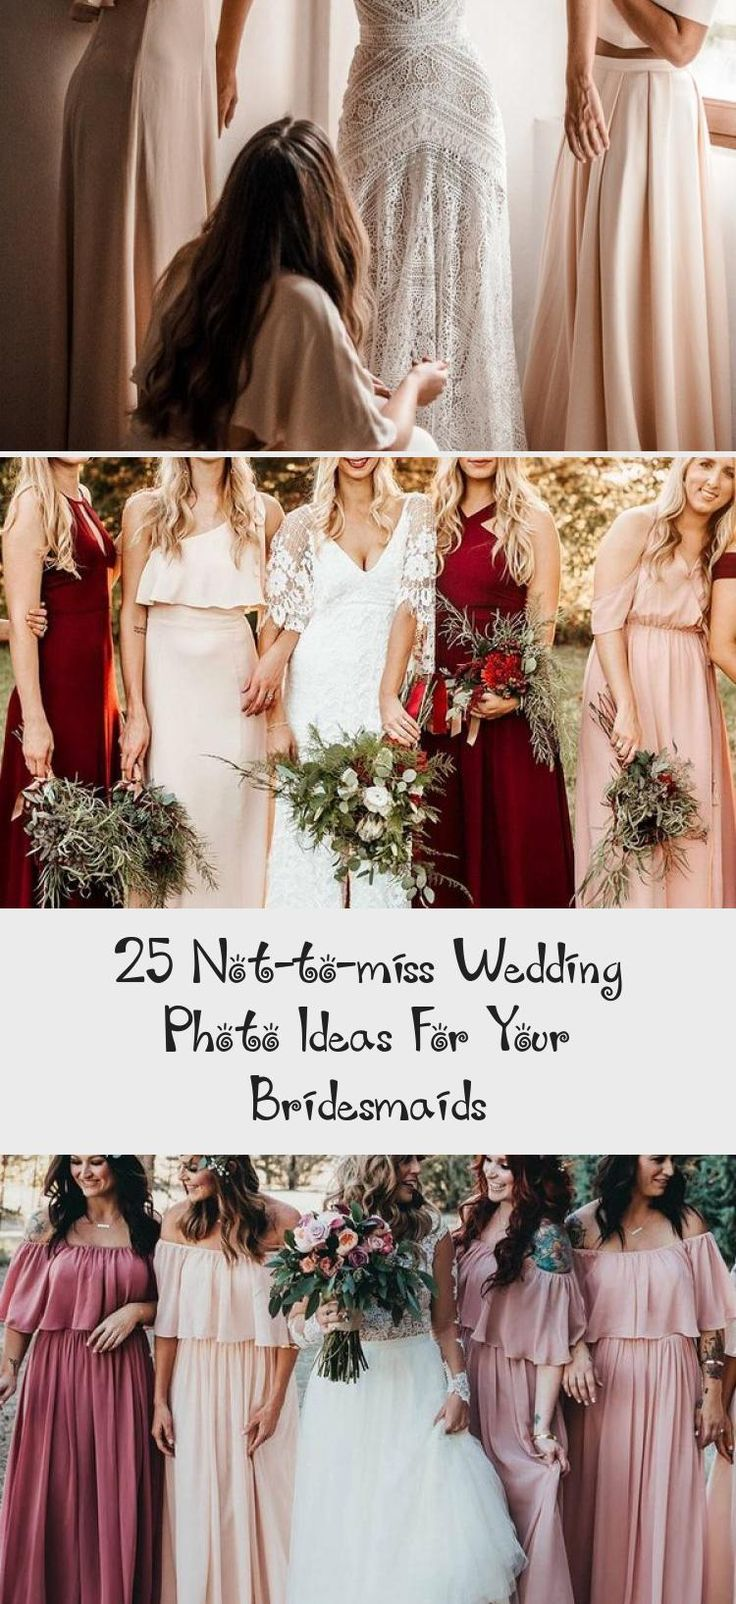 Wedding Photo Ideas For Your Bridesmaids  #wedding #weddingideas #weddingphotos #deerpearlflowers #BridesmaidDressesFall #BridesmaidDressesStyles #CheapBridesmaidDresses #BlushBridesmaidDresses #BridesmaidDressesSummer